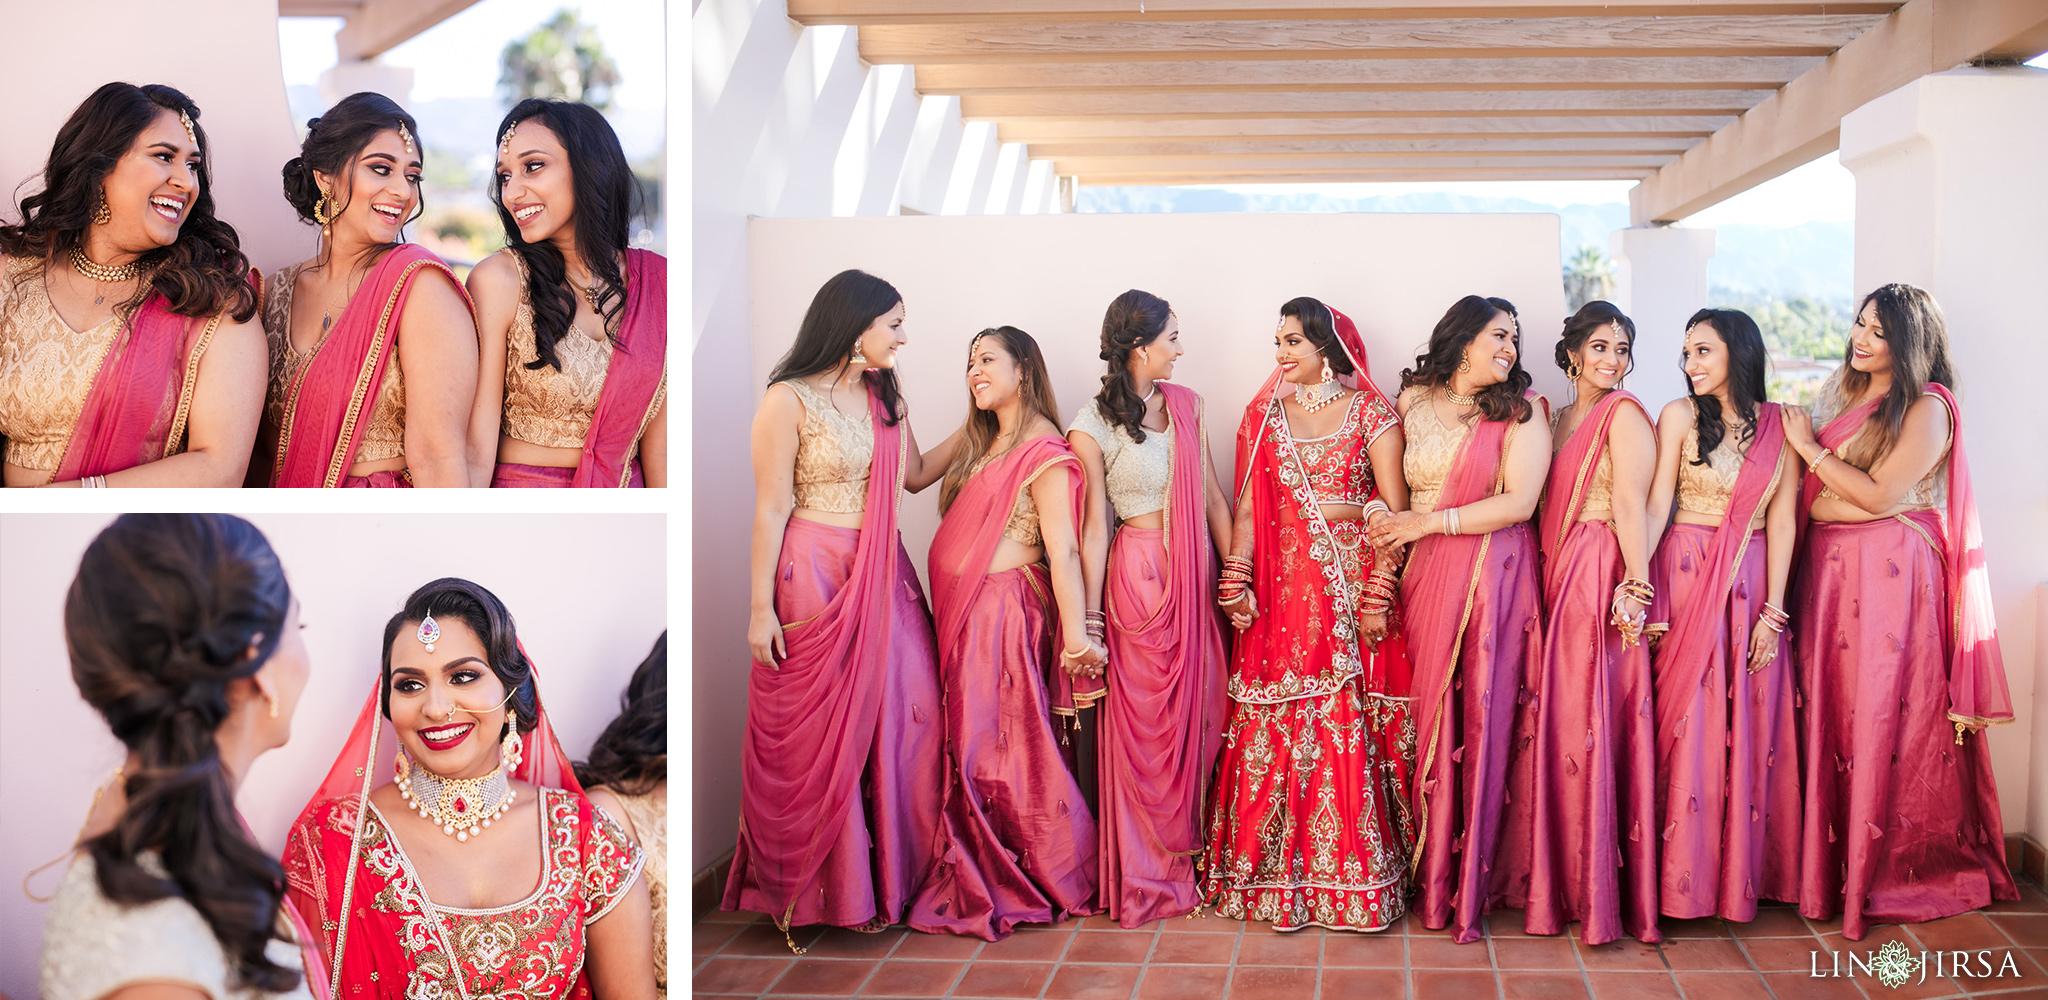 07 Hilton Santa Barbara Indian Wedding Photography